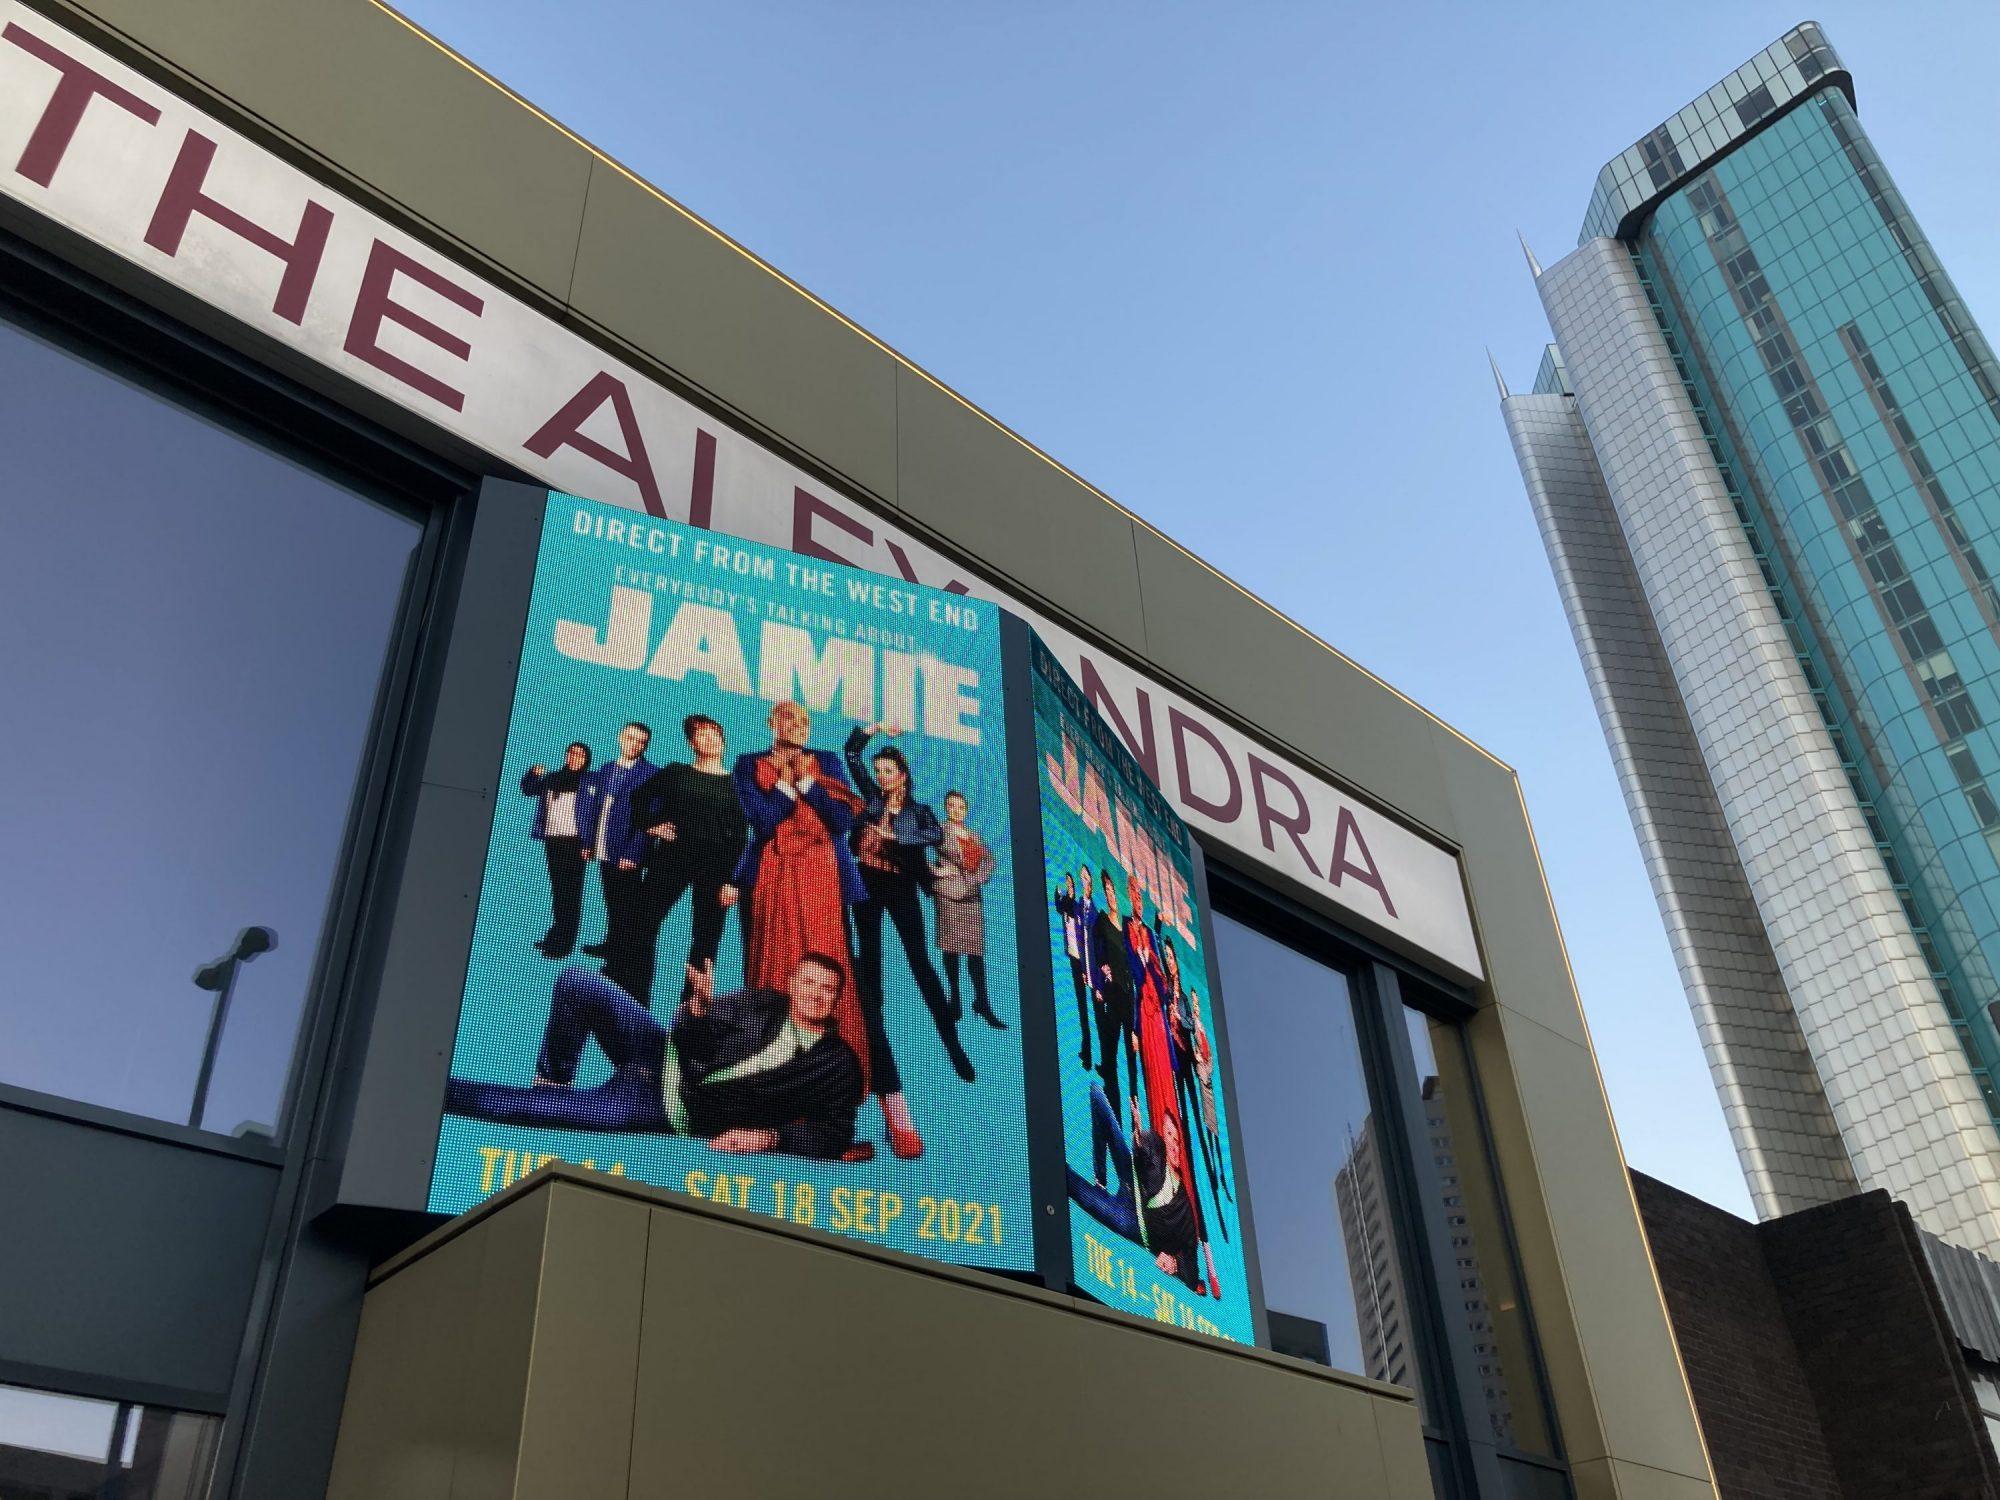 New Alexandra Theatre in Birmingham